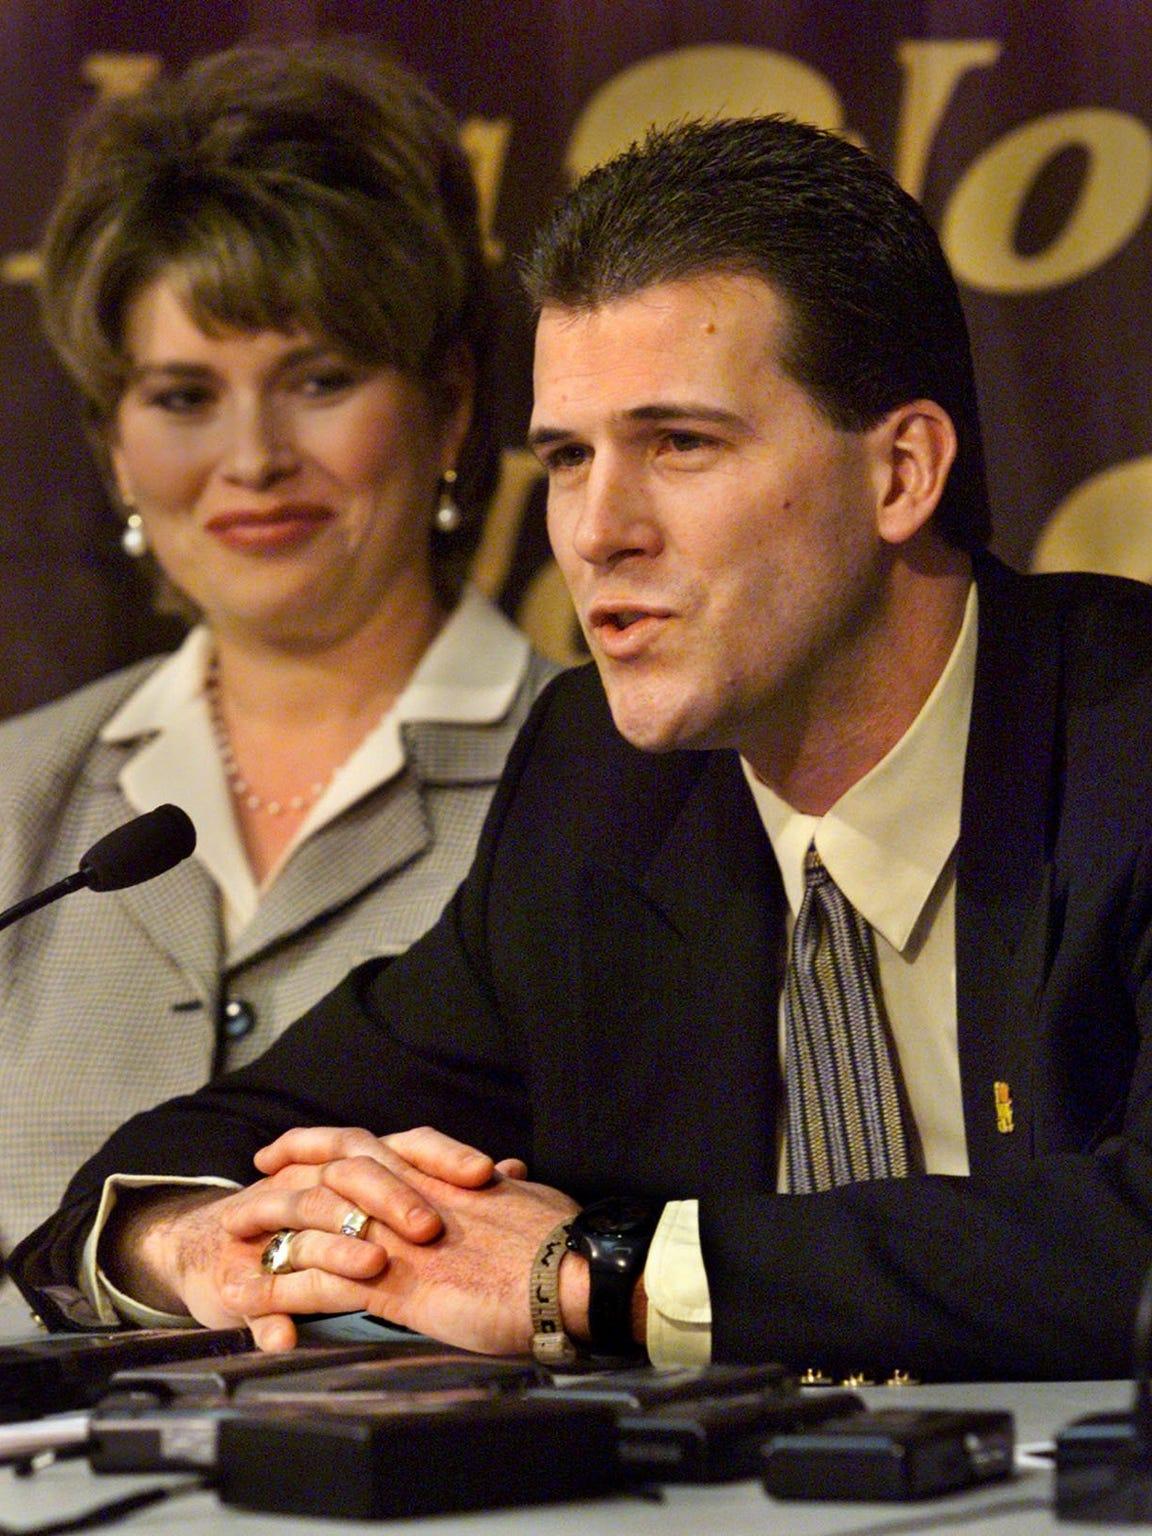 Steve Alford, who succeeded Tom Davis as the University